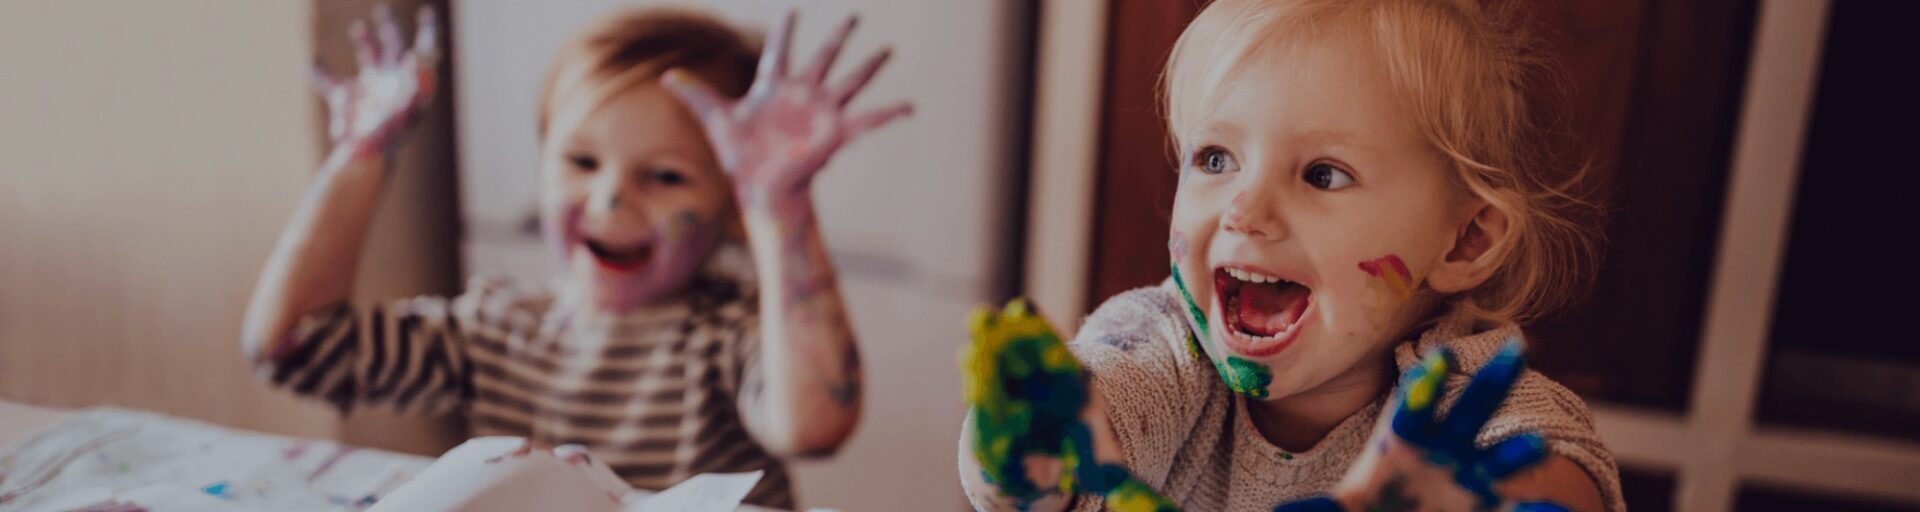 Nannypax Activity & Recipe Packs | Tax-Free Childcare | Nannytax